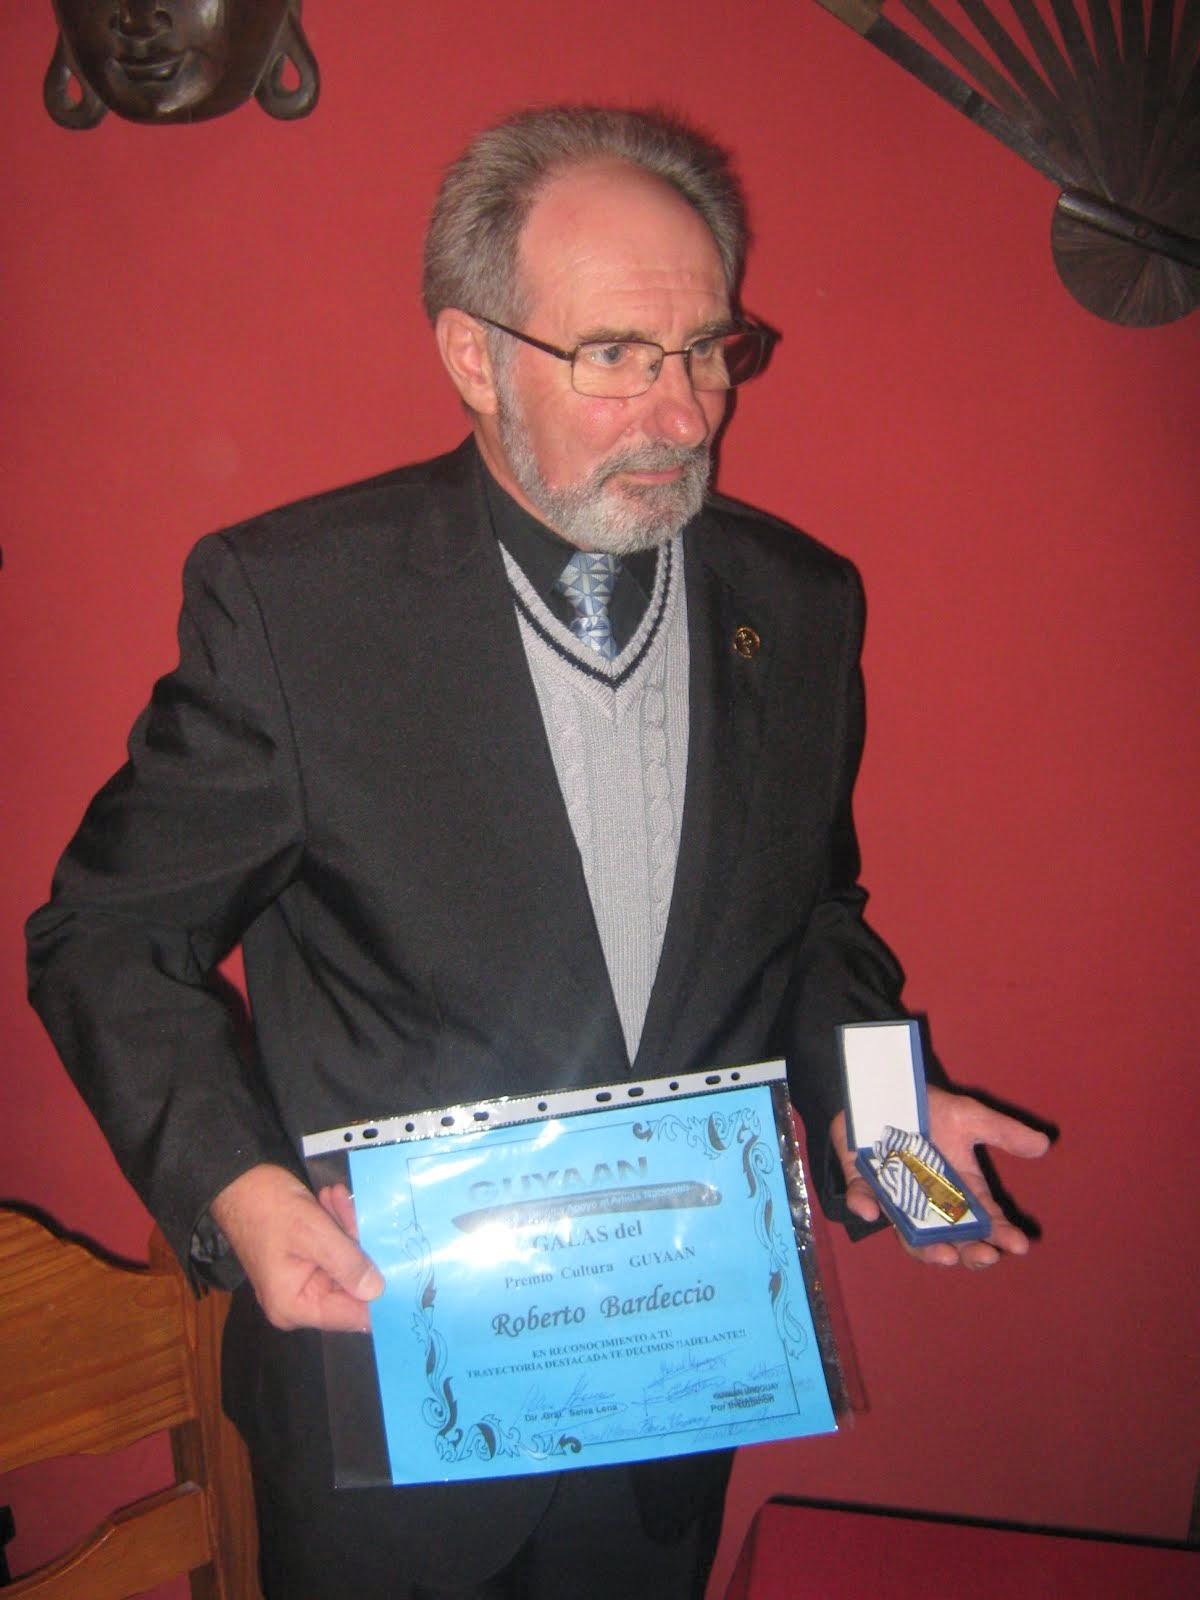 Premio GUYAAN 2014